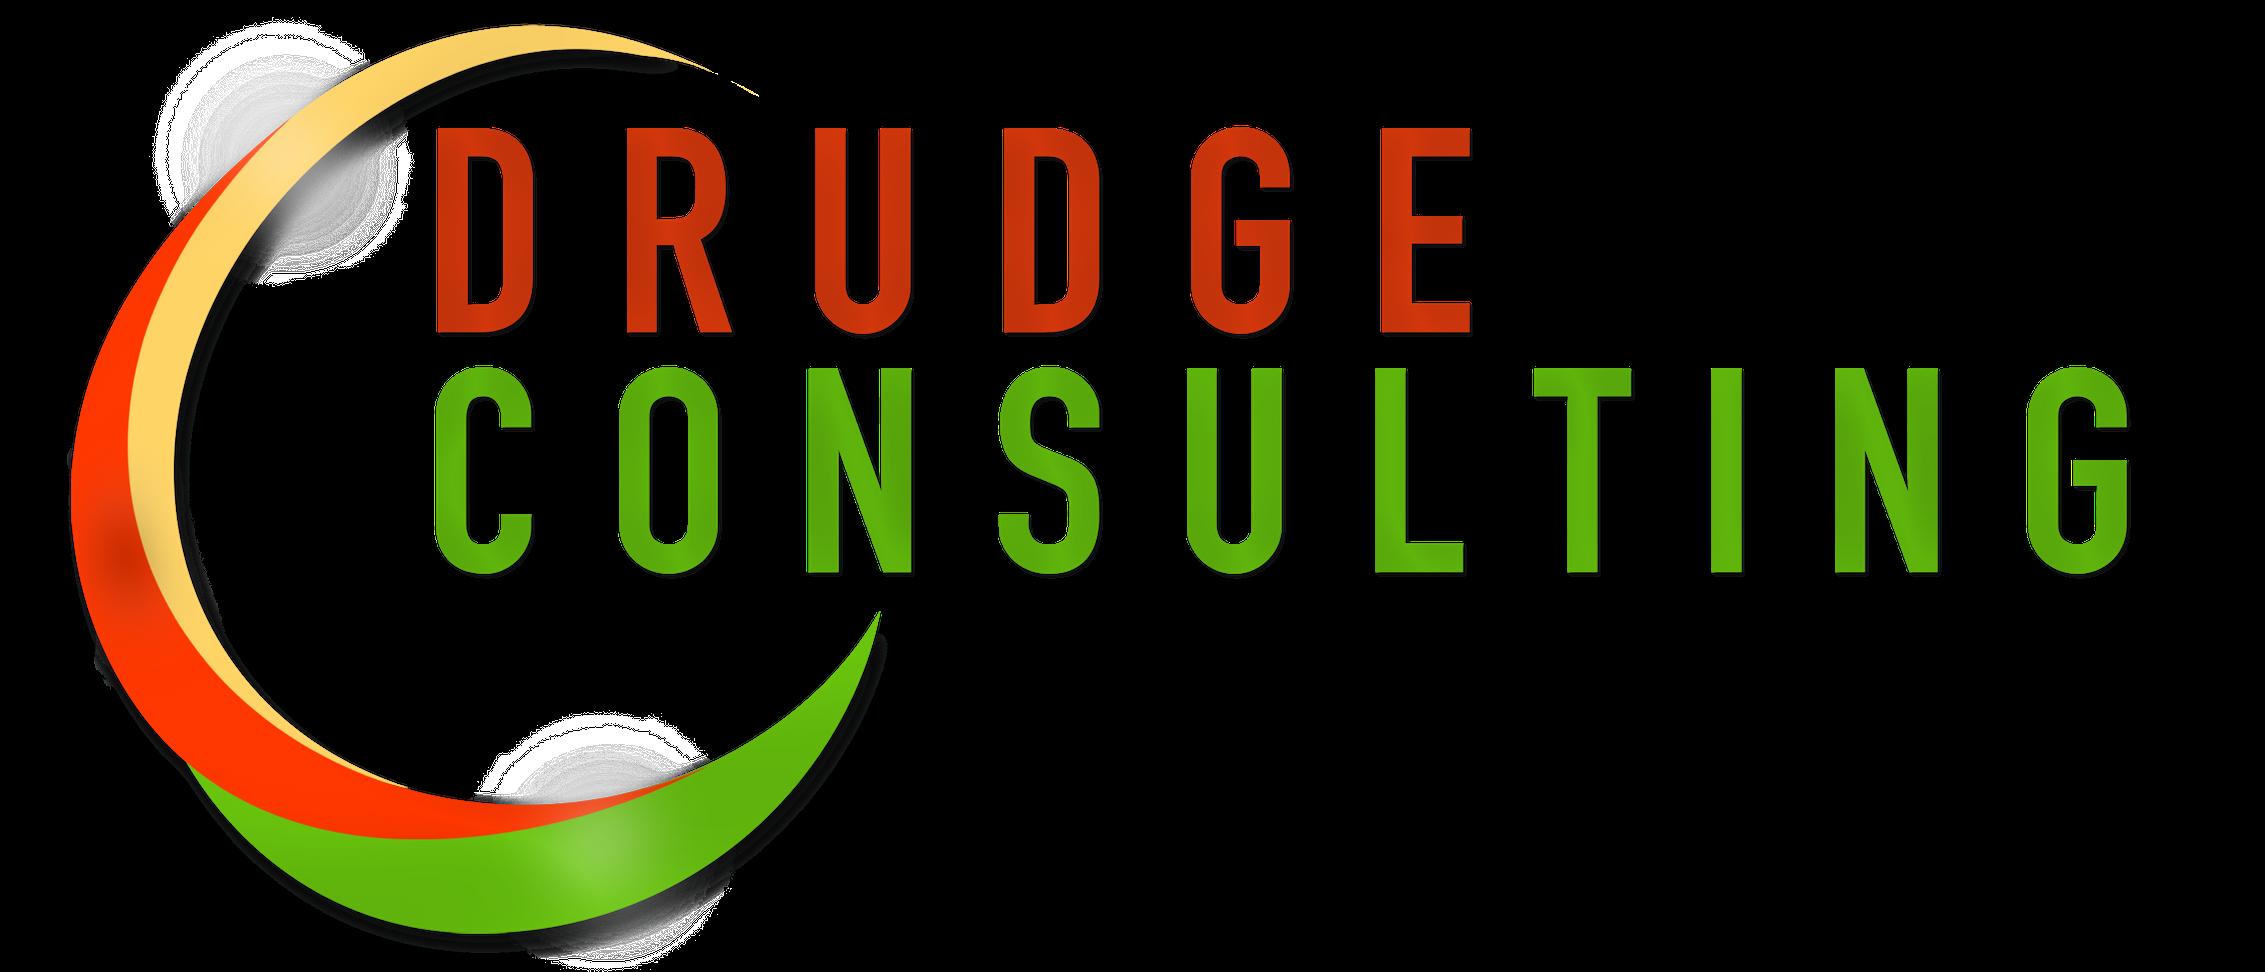 Drudge Consulting